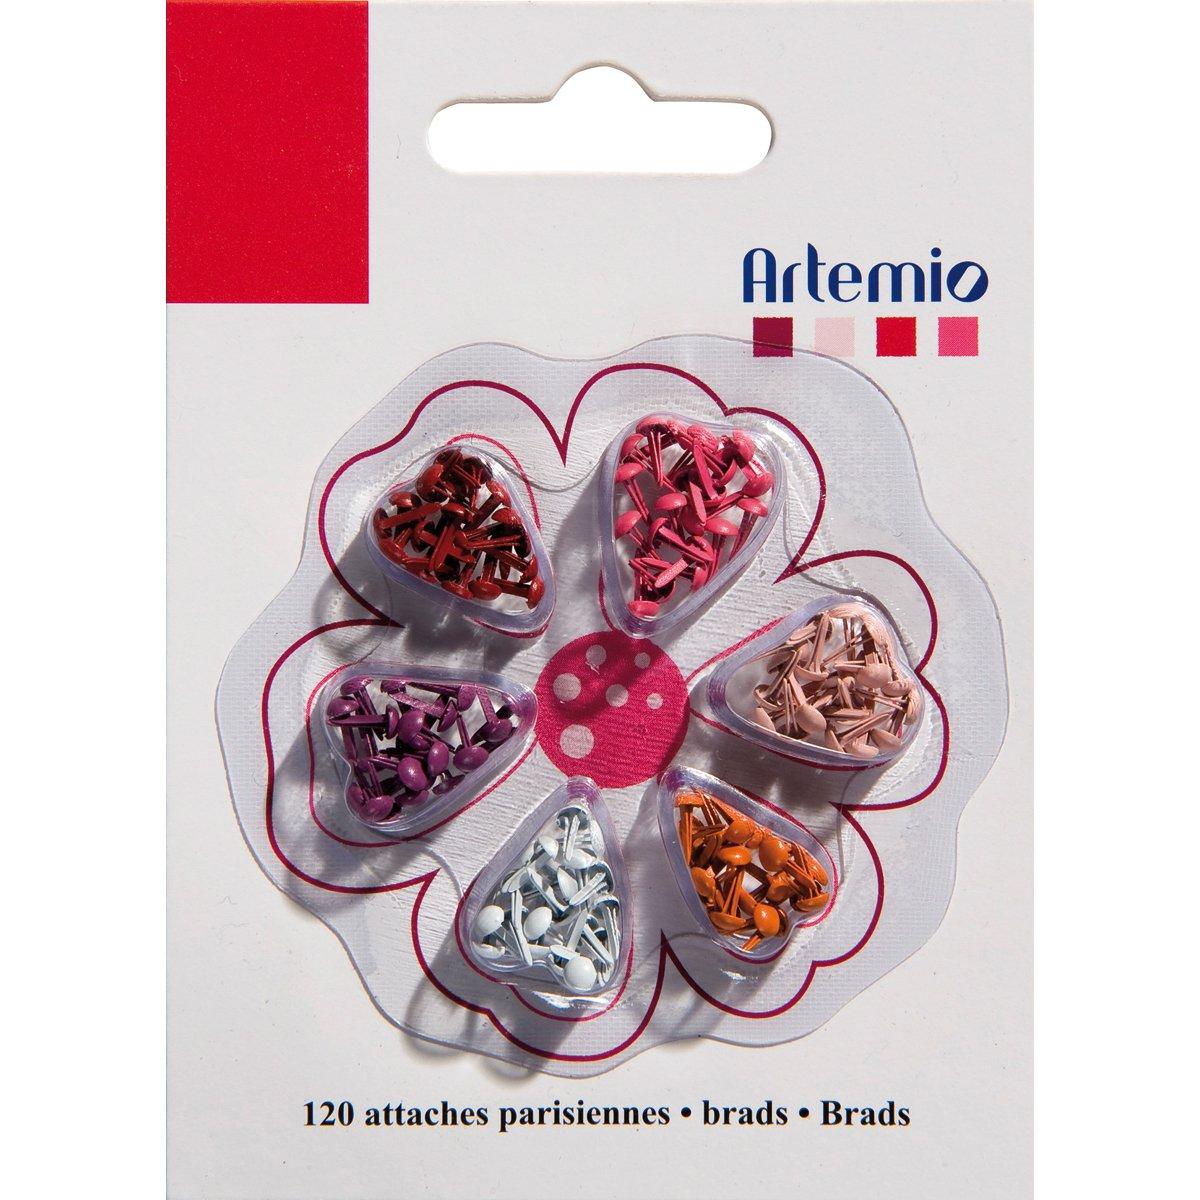 tama/ño peque/ño, 120 unidades color rojo Mini tachuelas Artemio